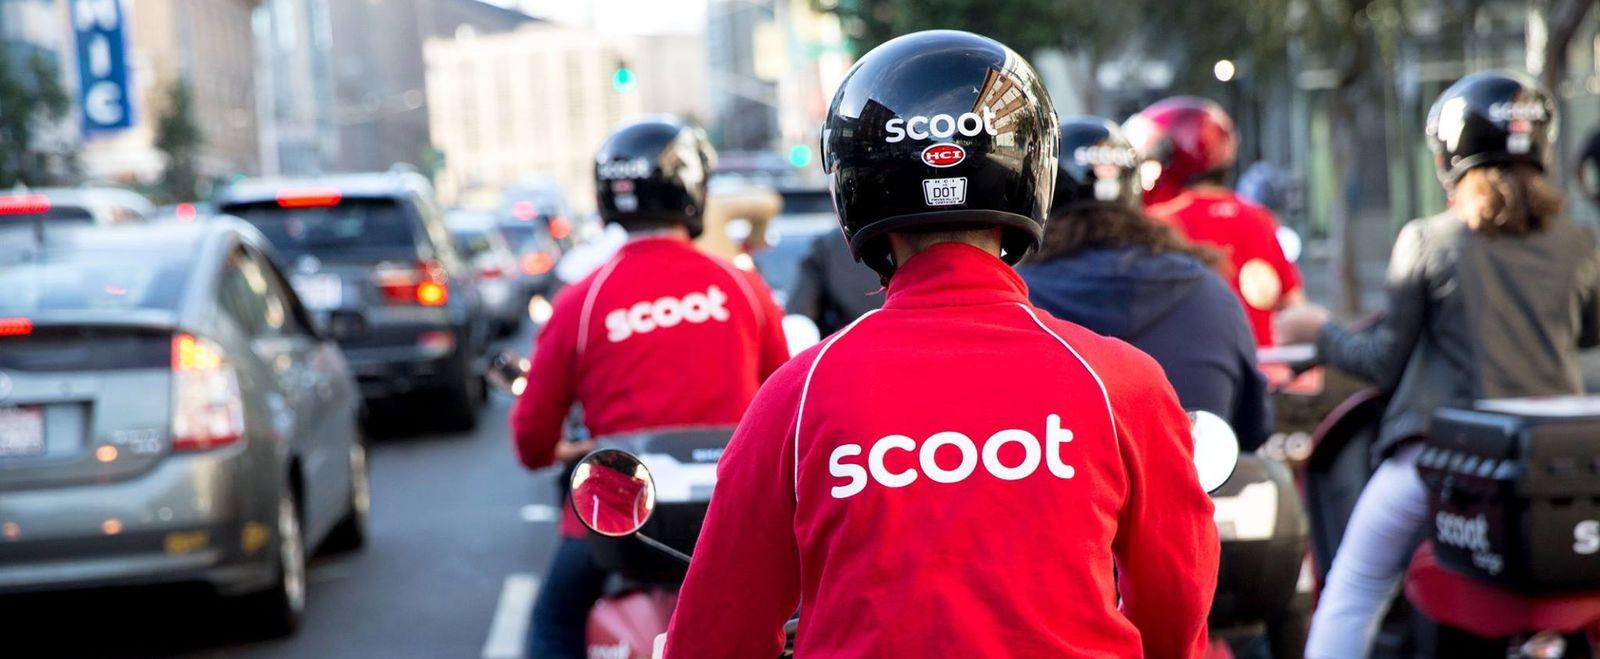 Scoot transportation